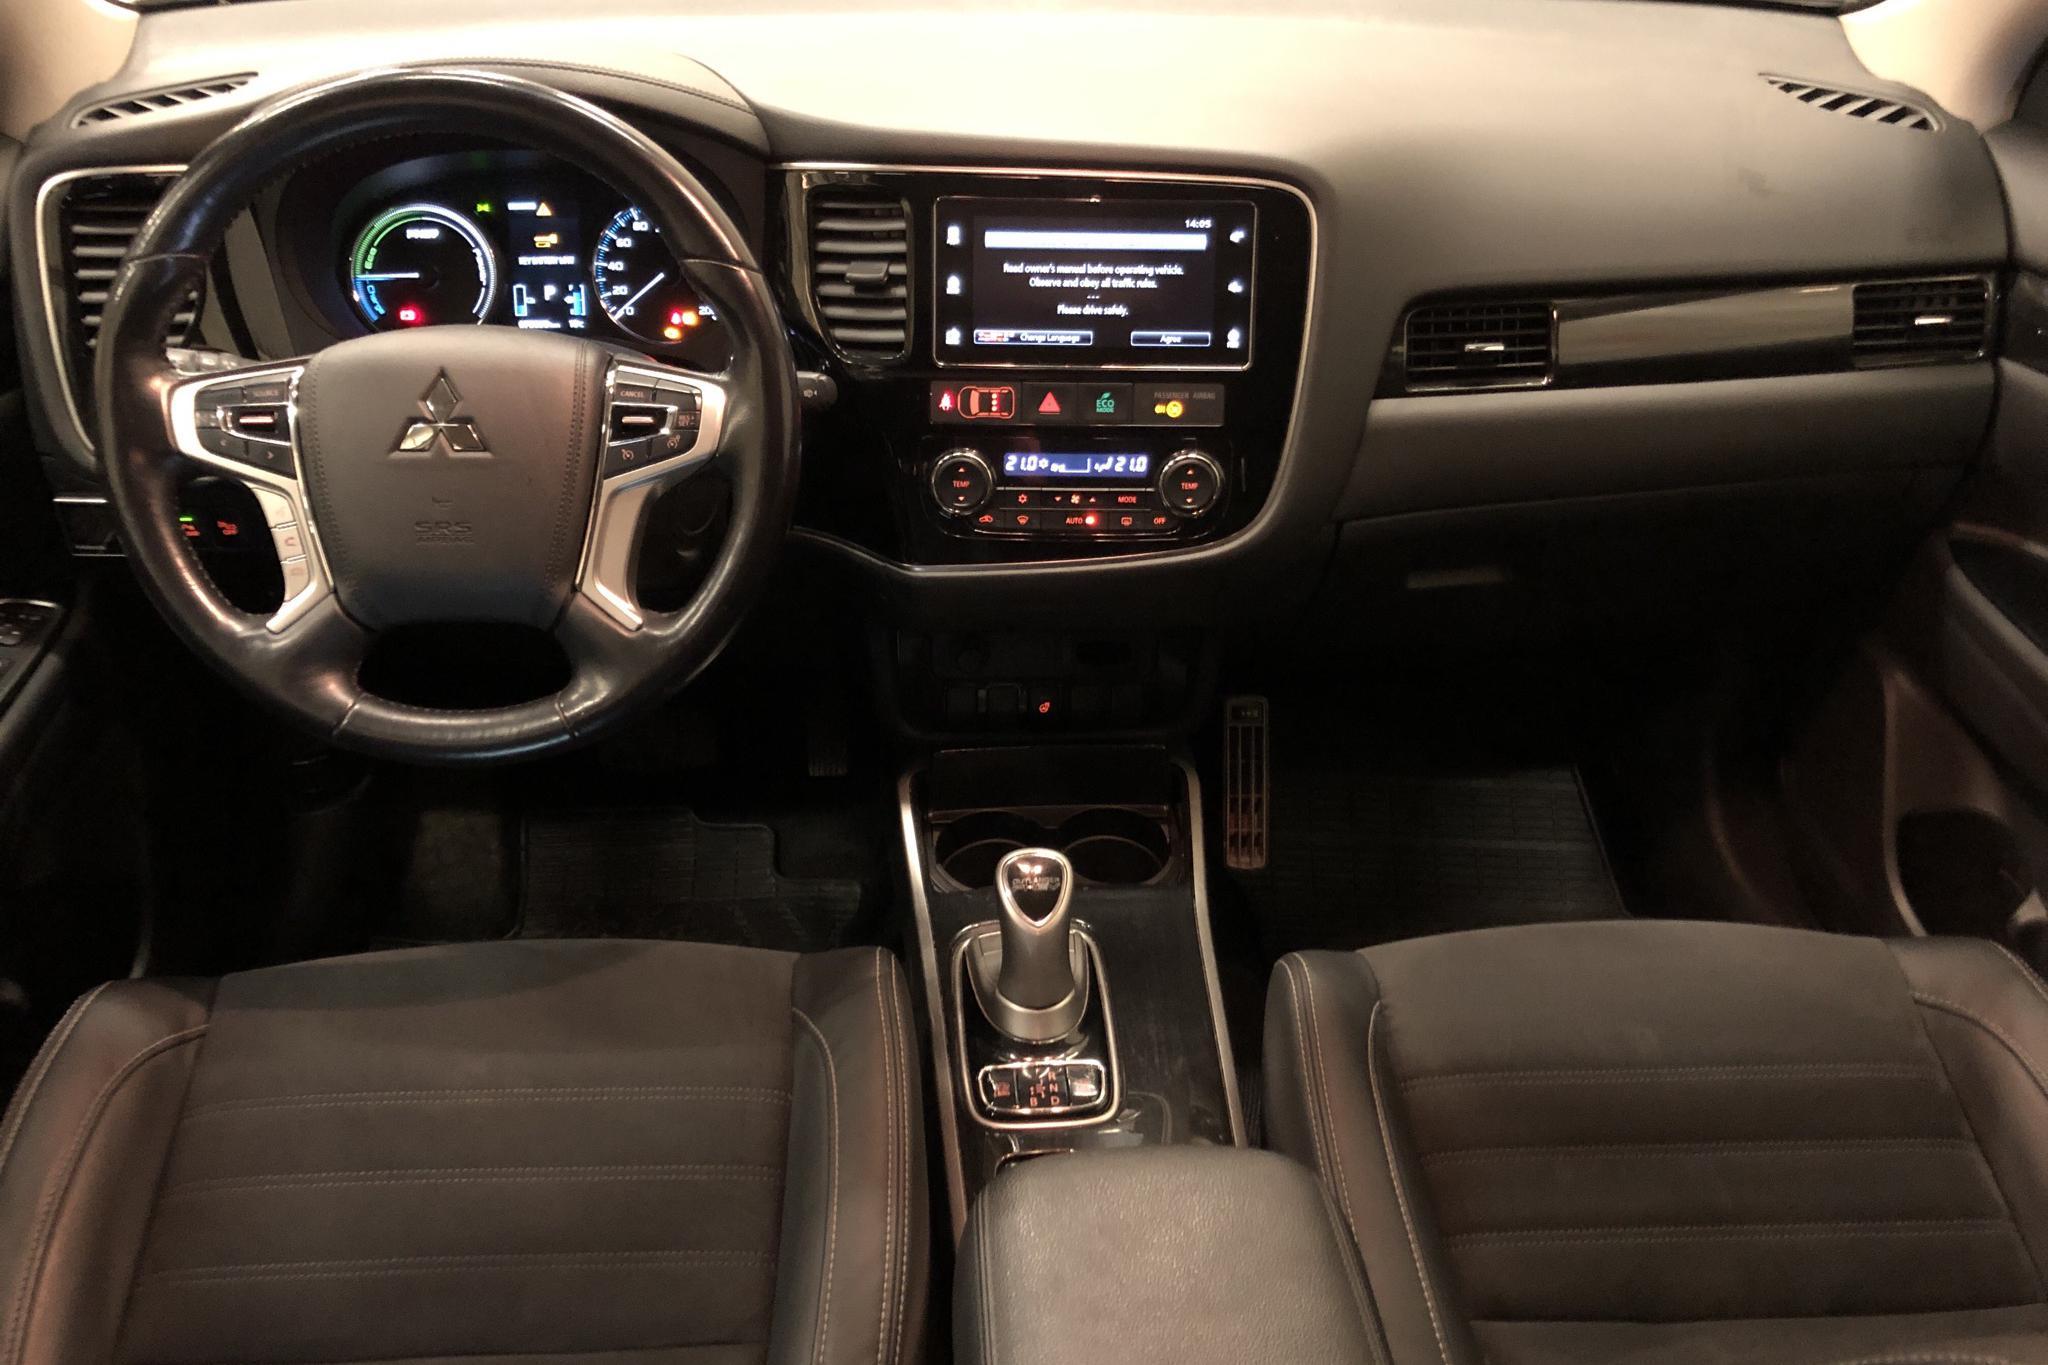 Mitsubishi Outlander 2.0 Plug-in Hybrid 4WD (121hk) - 7 811 mil - Automat - vit - 2017